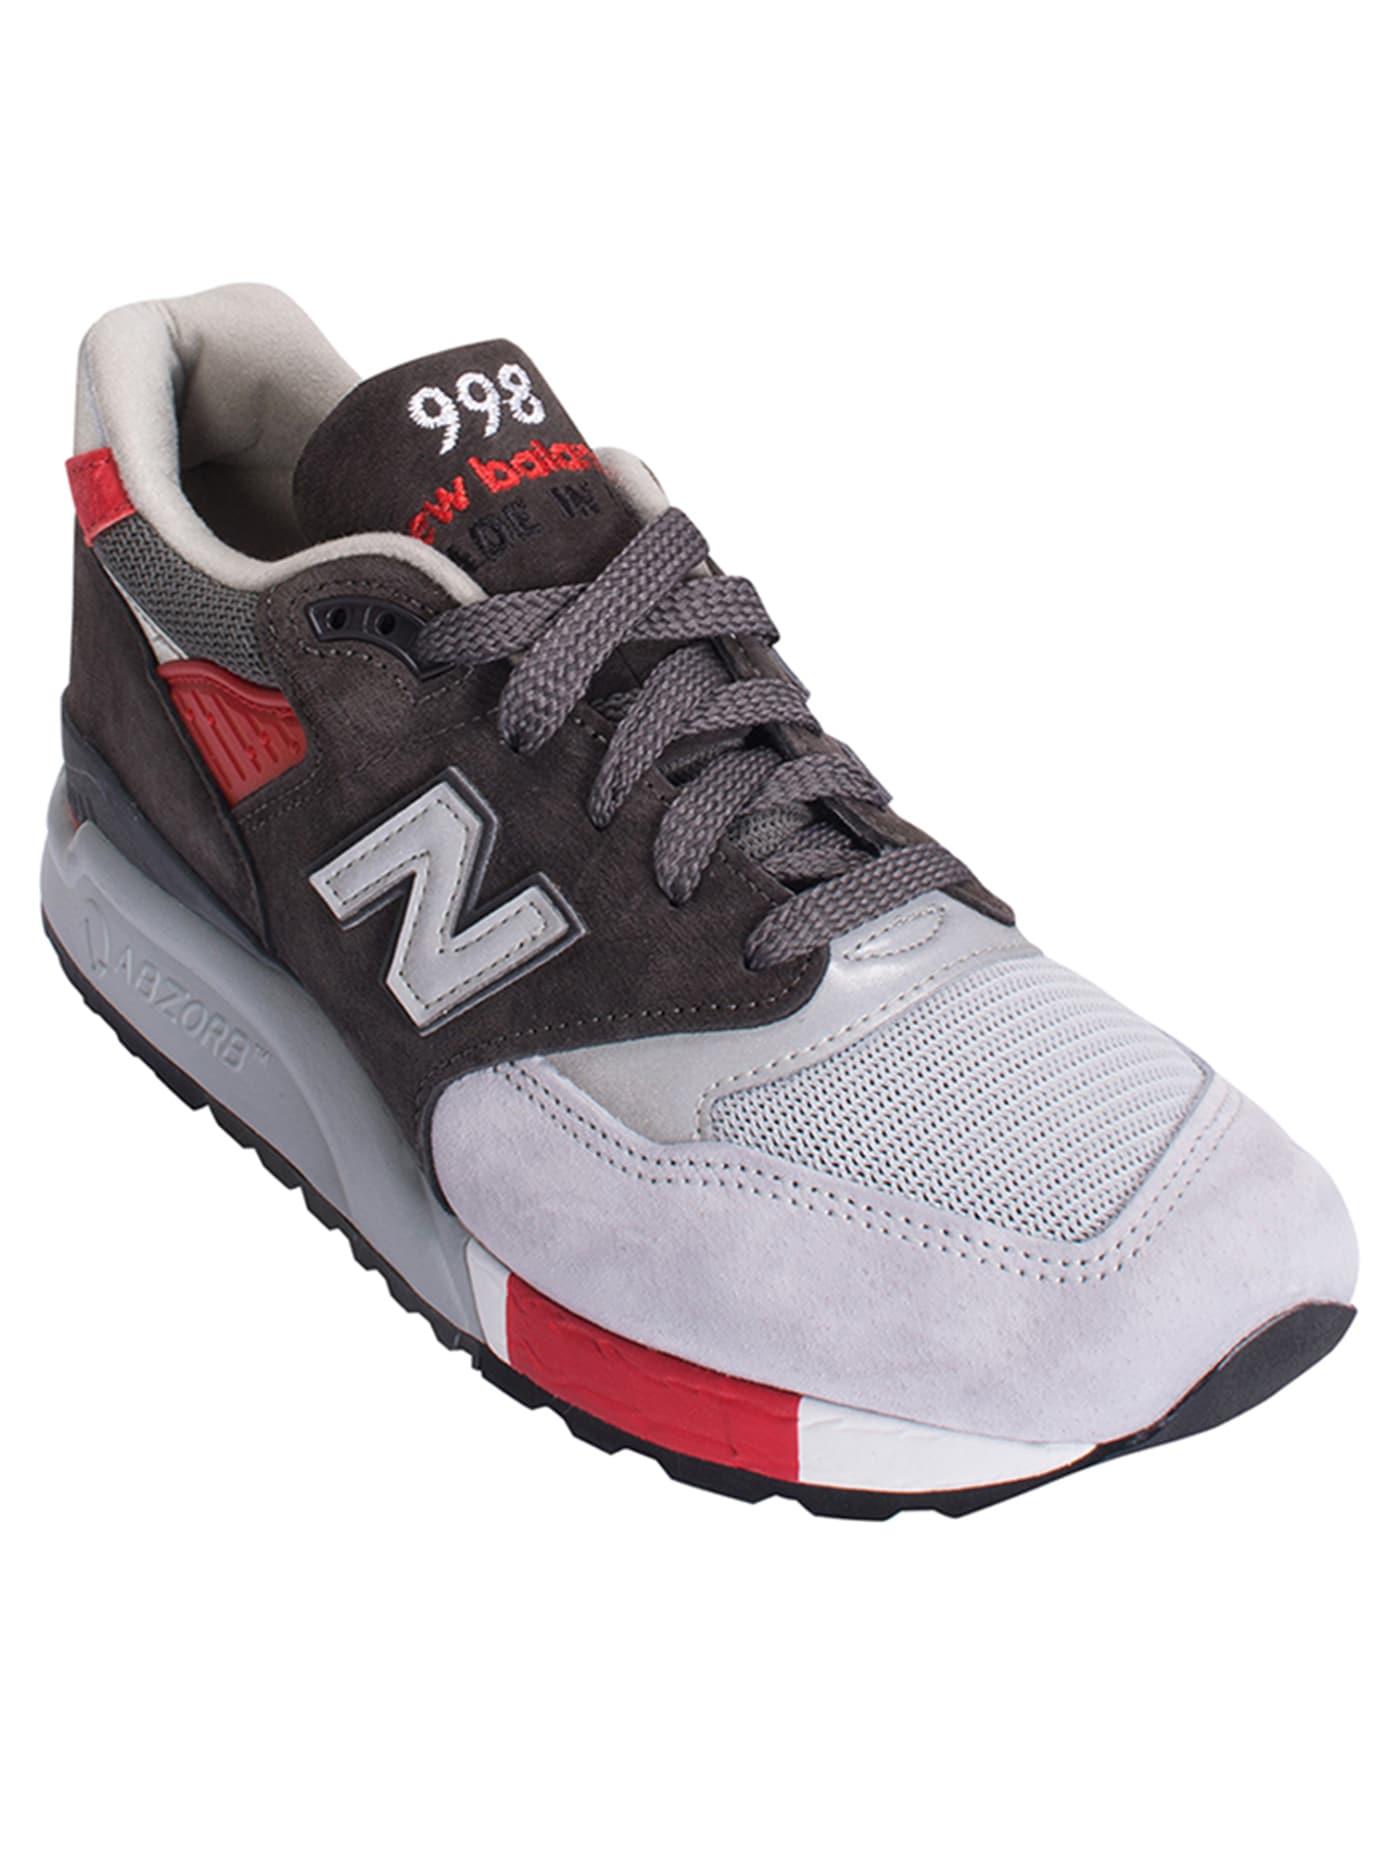 big sale 7fa5e 2b33a NEW BALANCE รองเท้าลำลองผู้ชาย รุ่น M998CPL 998 Age of ...